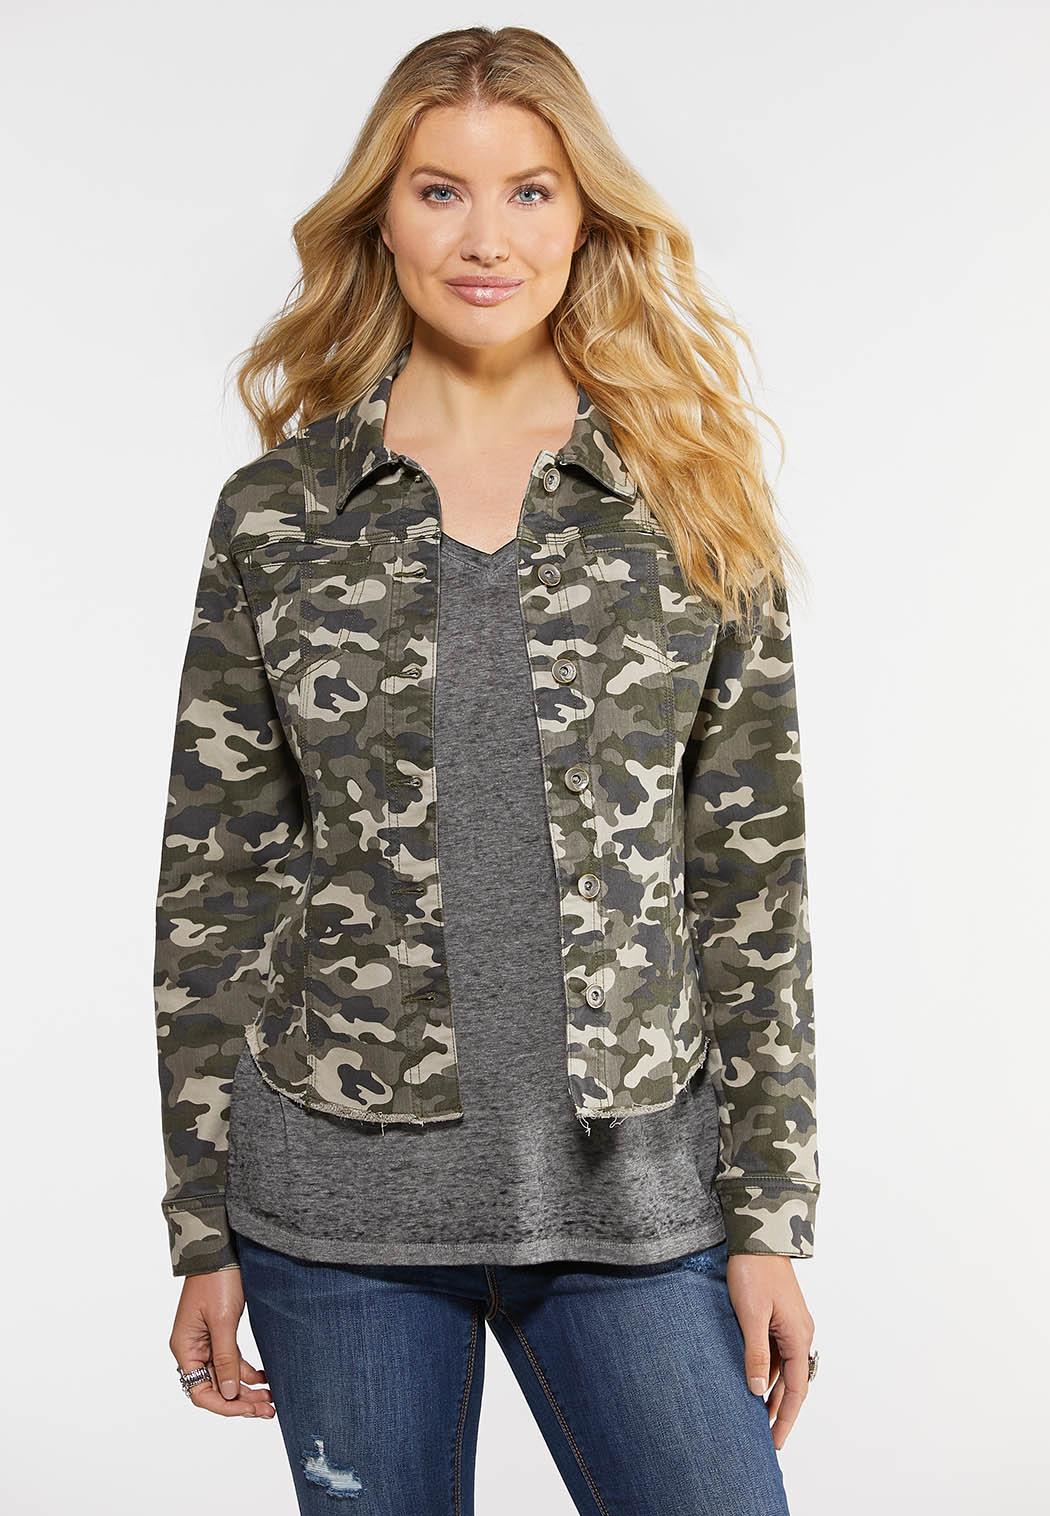 Plus Size Raw Hem Camo Jacket Jackets & Amp ; Vests Cato Fashions